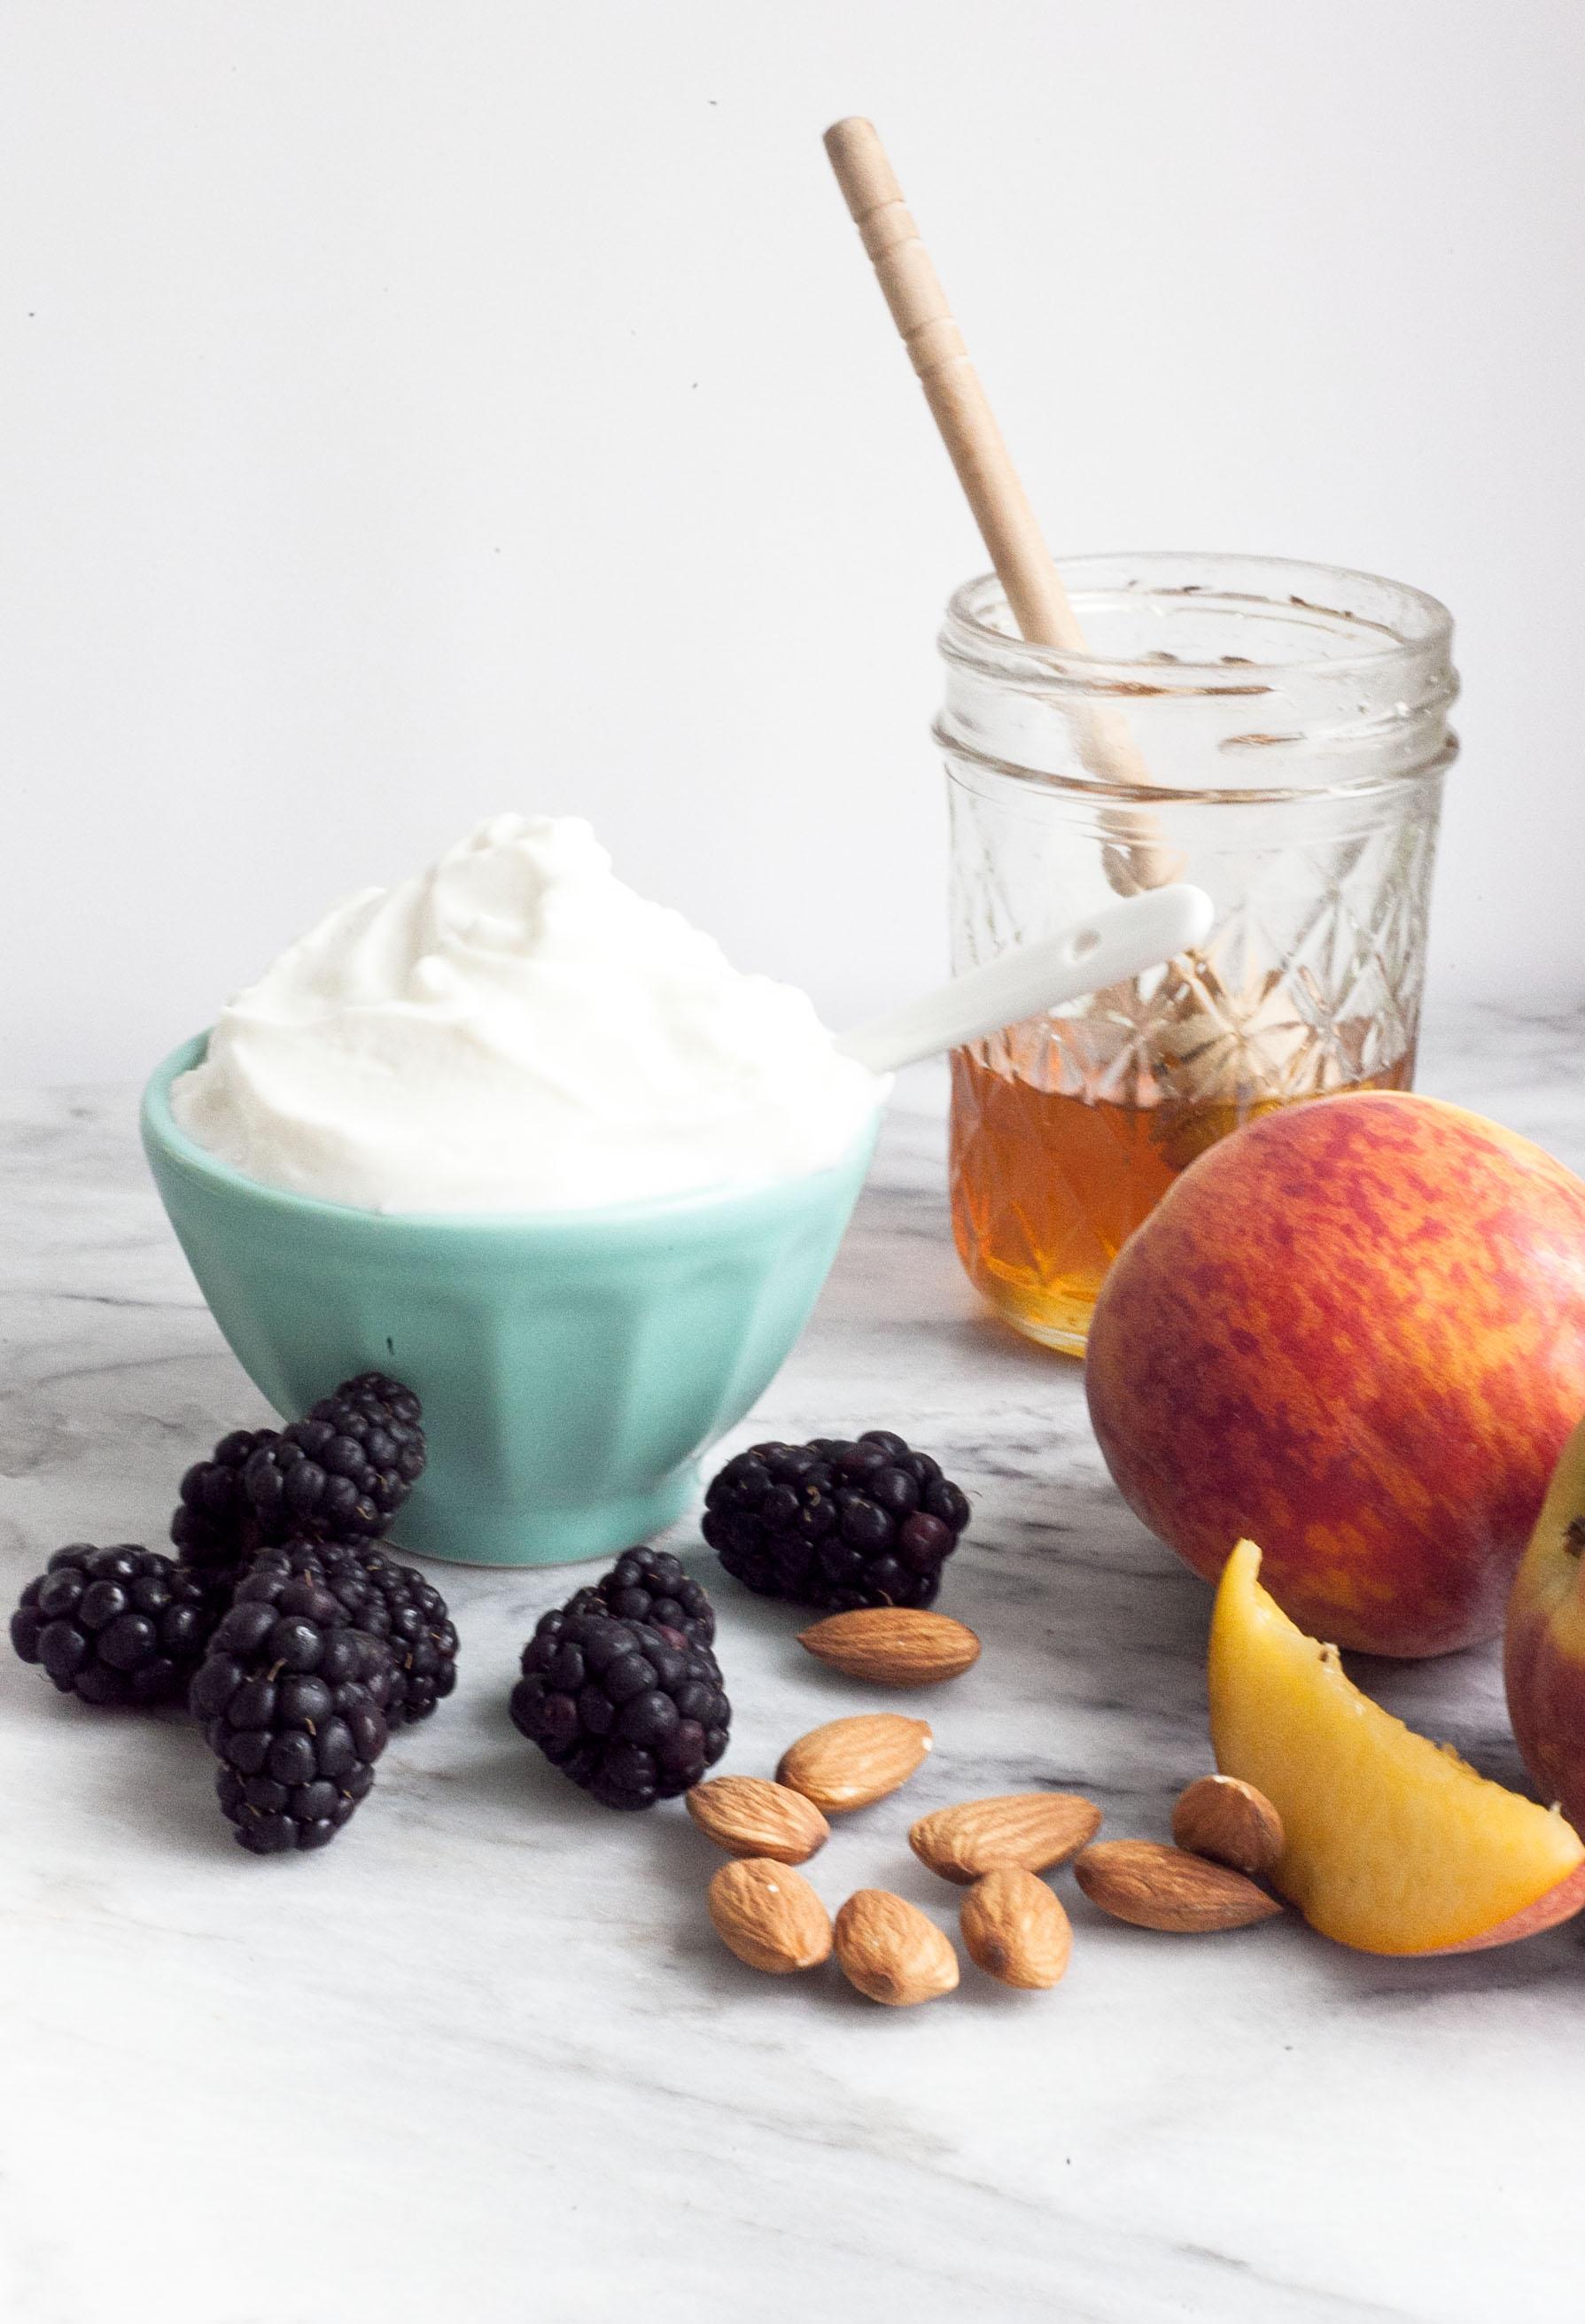 5 Best Greek Yogurt Toppings